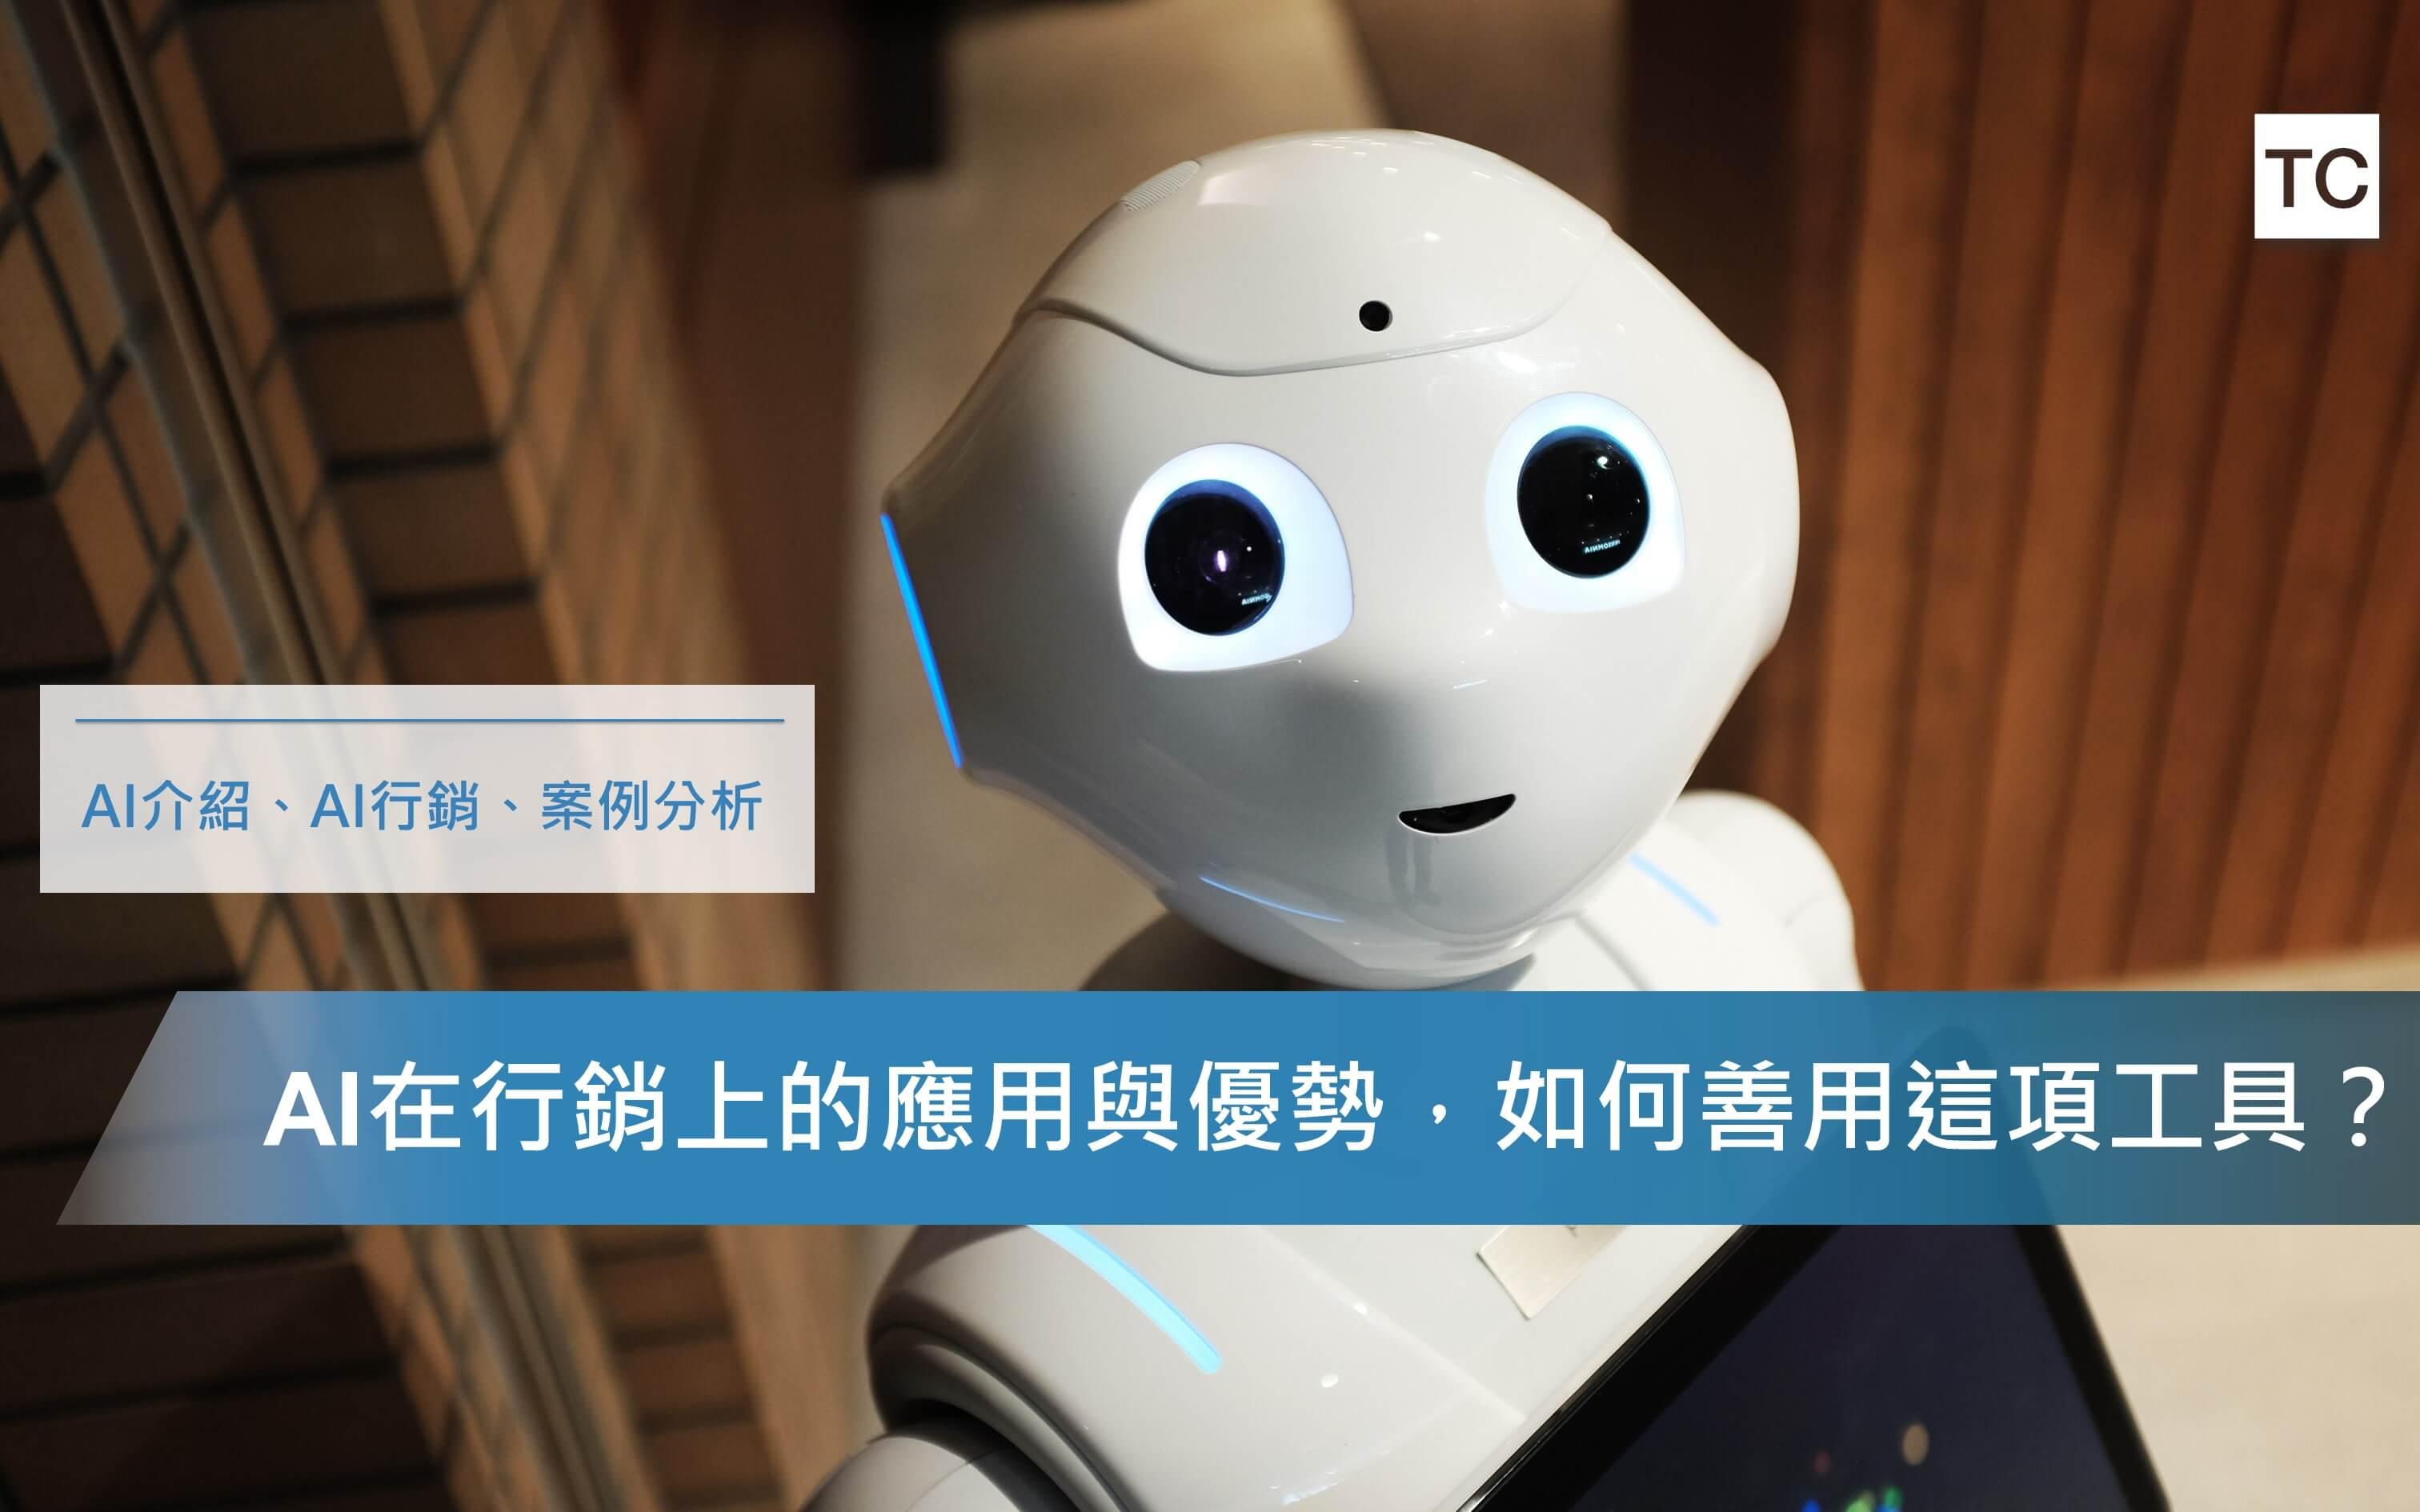 AI人工智慧與行銷,聊天機器人、個人化分析等最夯趨勢總整理